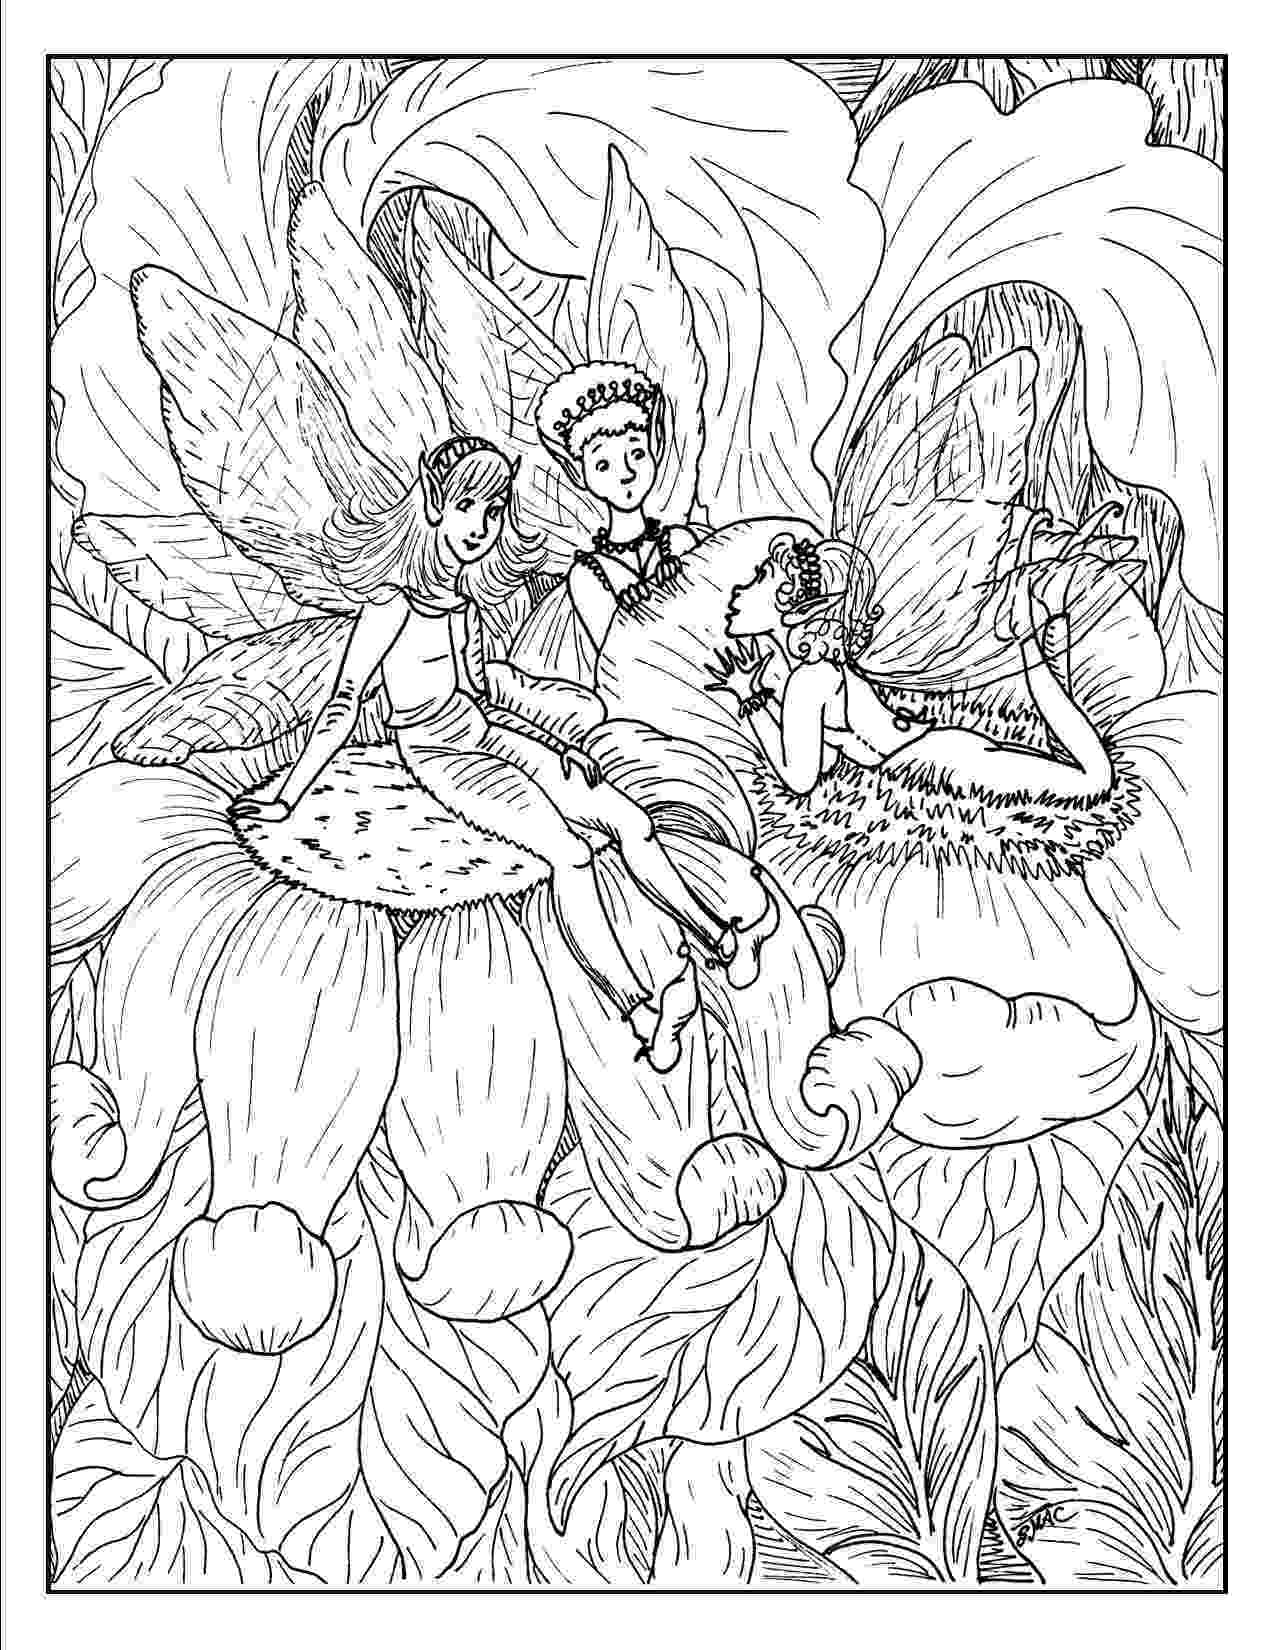 coloring pages fantasy fantasy coloring pages best coloring pages for kids pages fantasy coloring